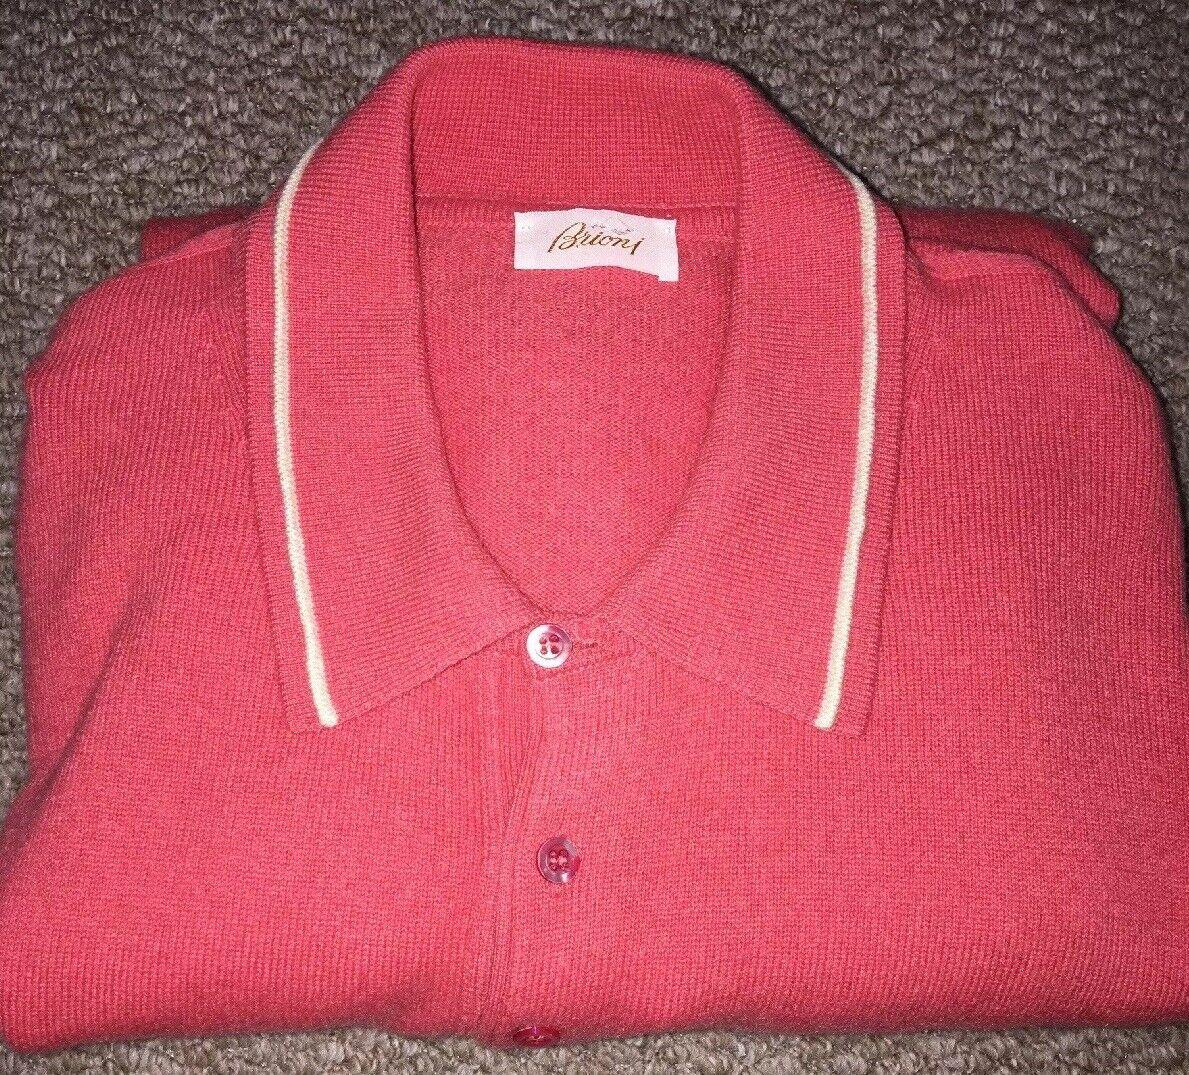 Brioni 100% Cashmere Classic Jumper Sweater Polo Top size XL (56) FREE P&P